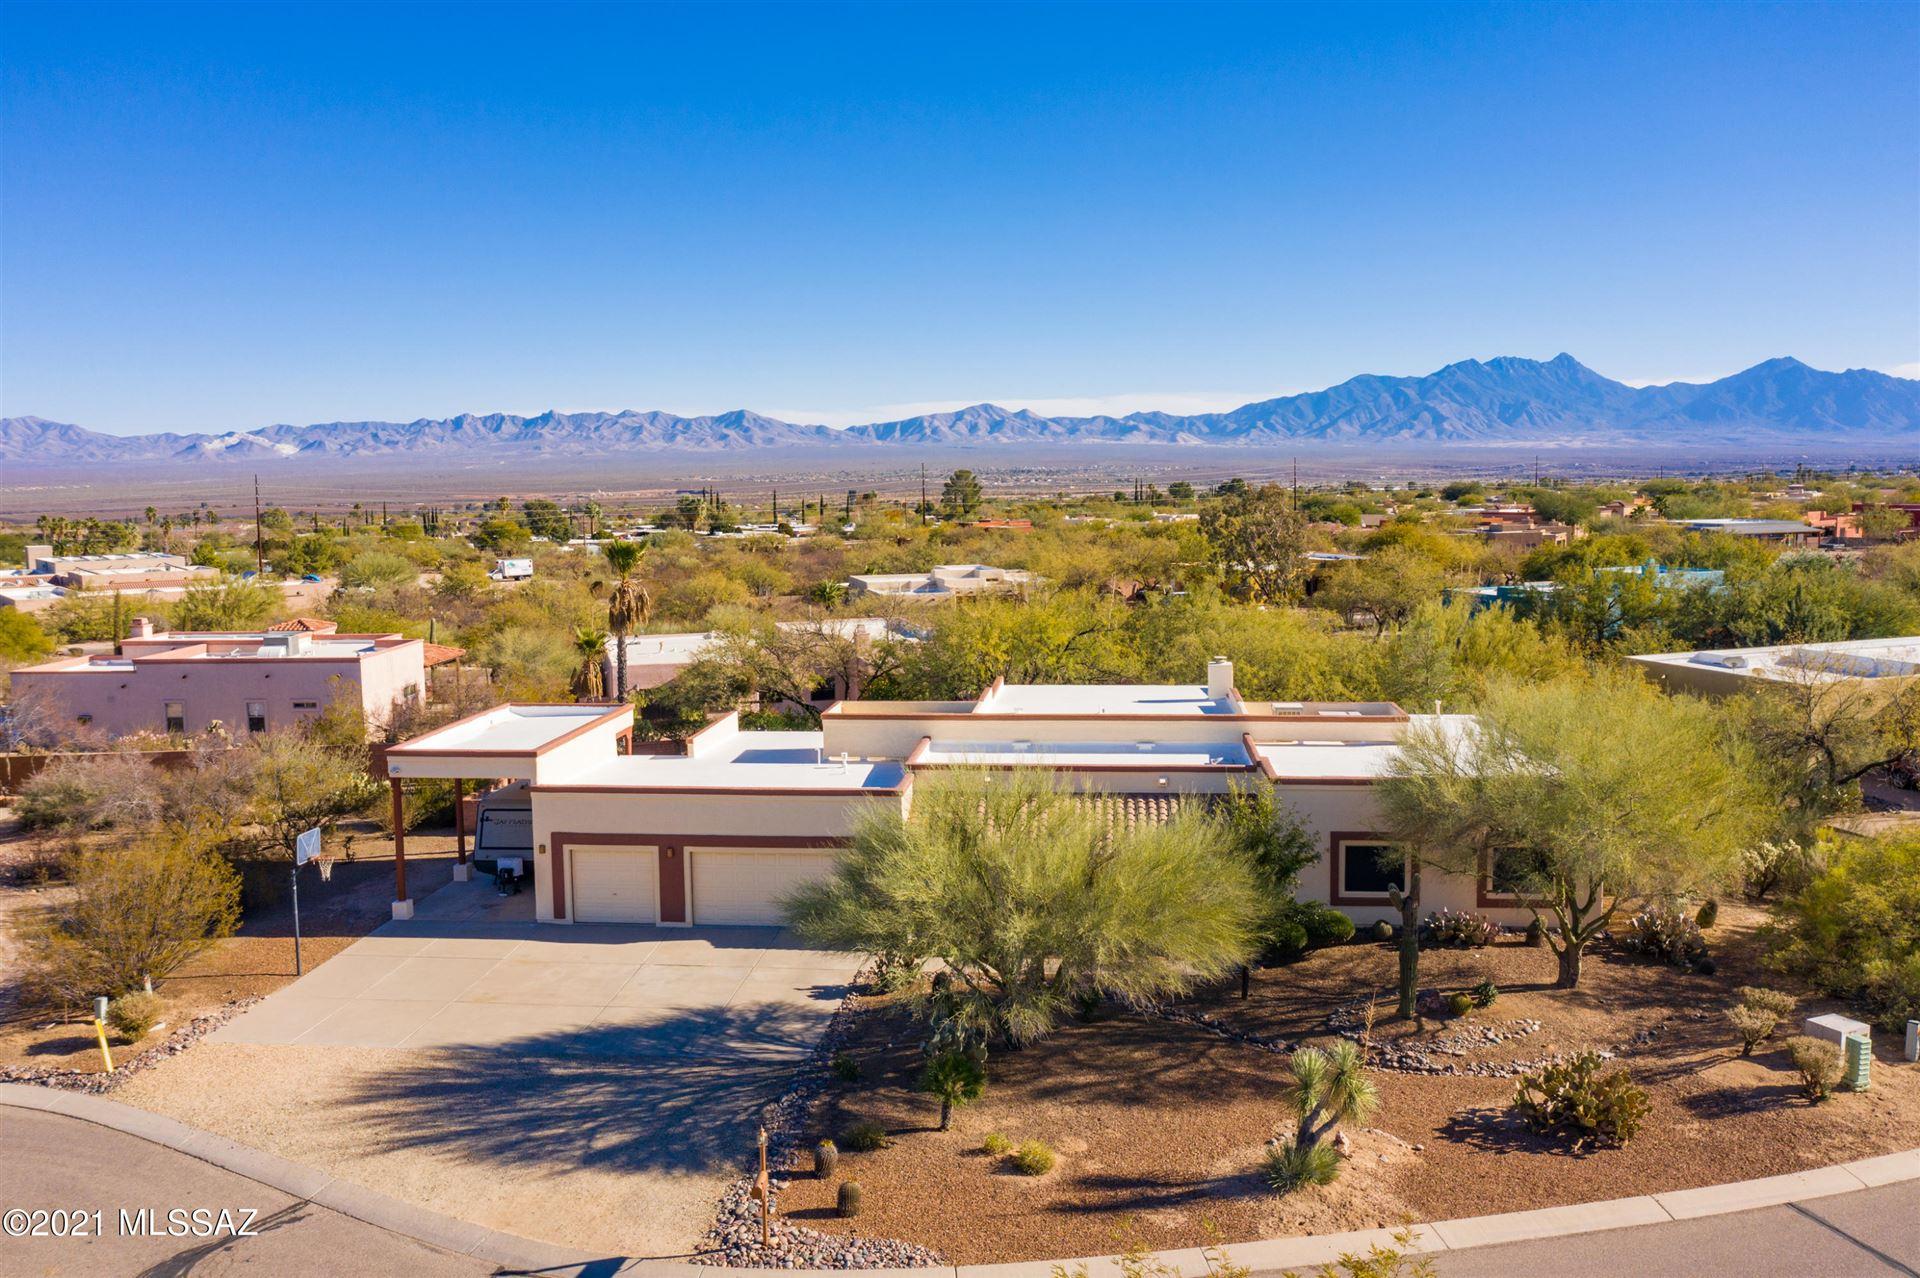 17725 S Placita Cocinera, Sahuarita, AZ 85629 - MLS#: 22100509